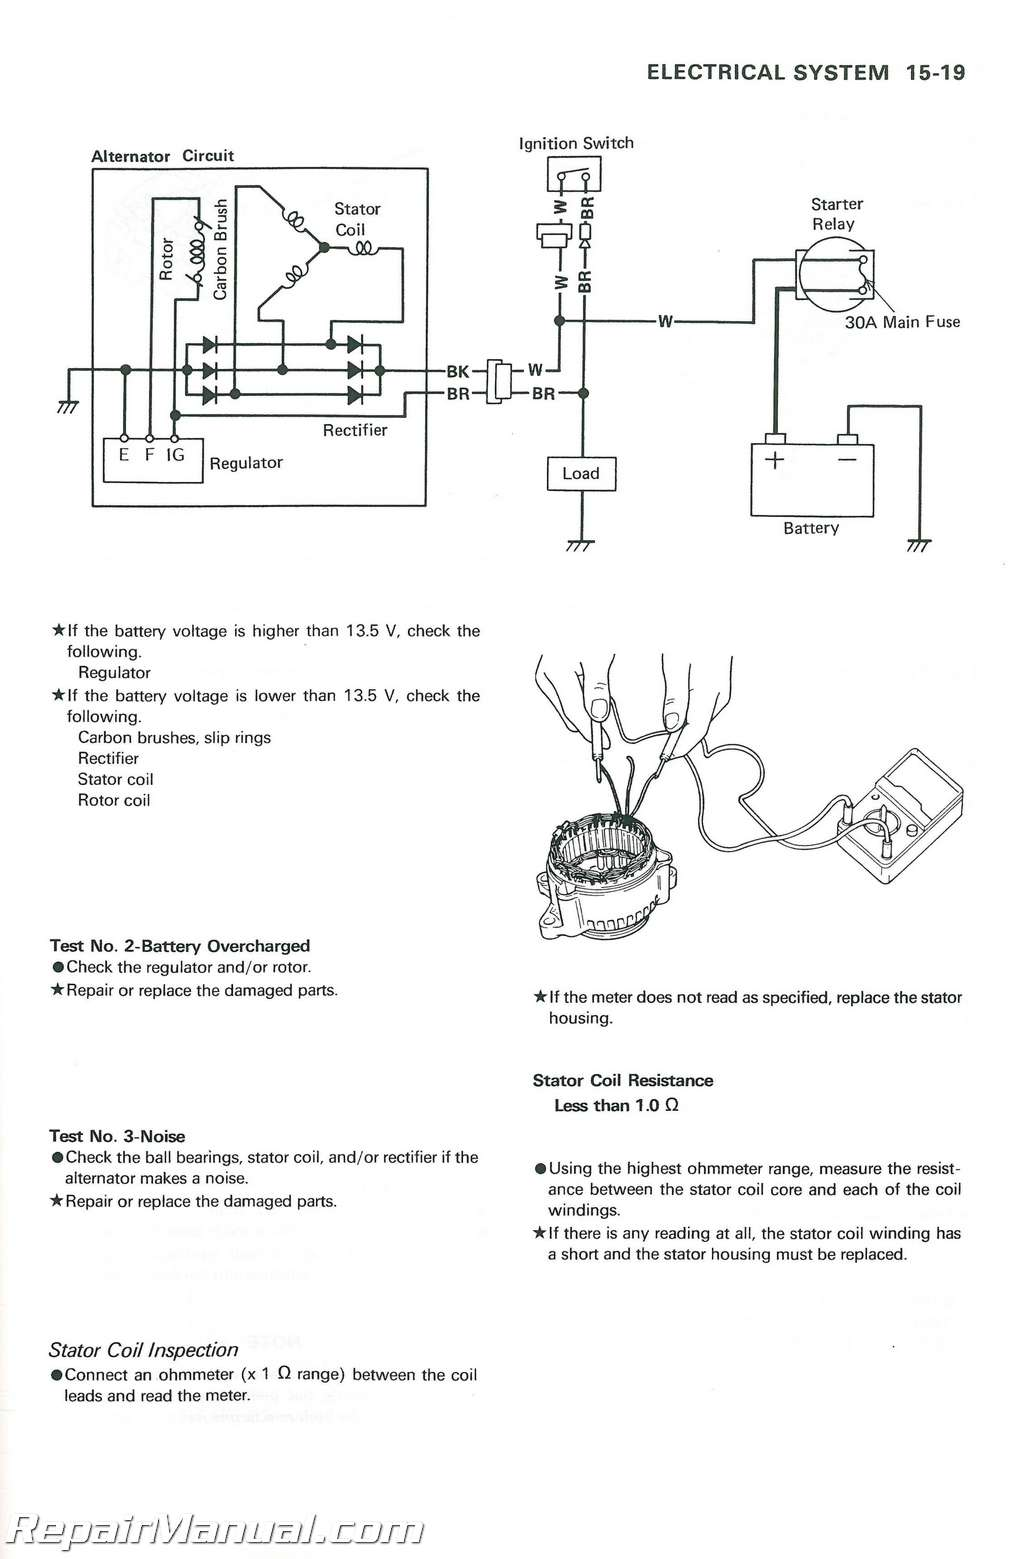 1989 1990 Kawasaki Zx750h Service Manual Zx7 Wiring Diagram